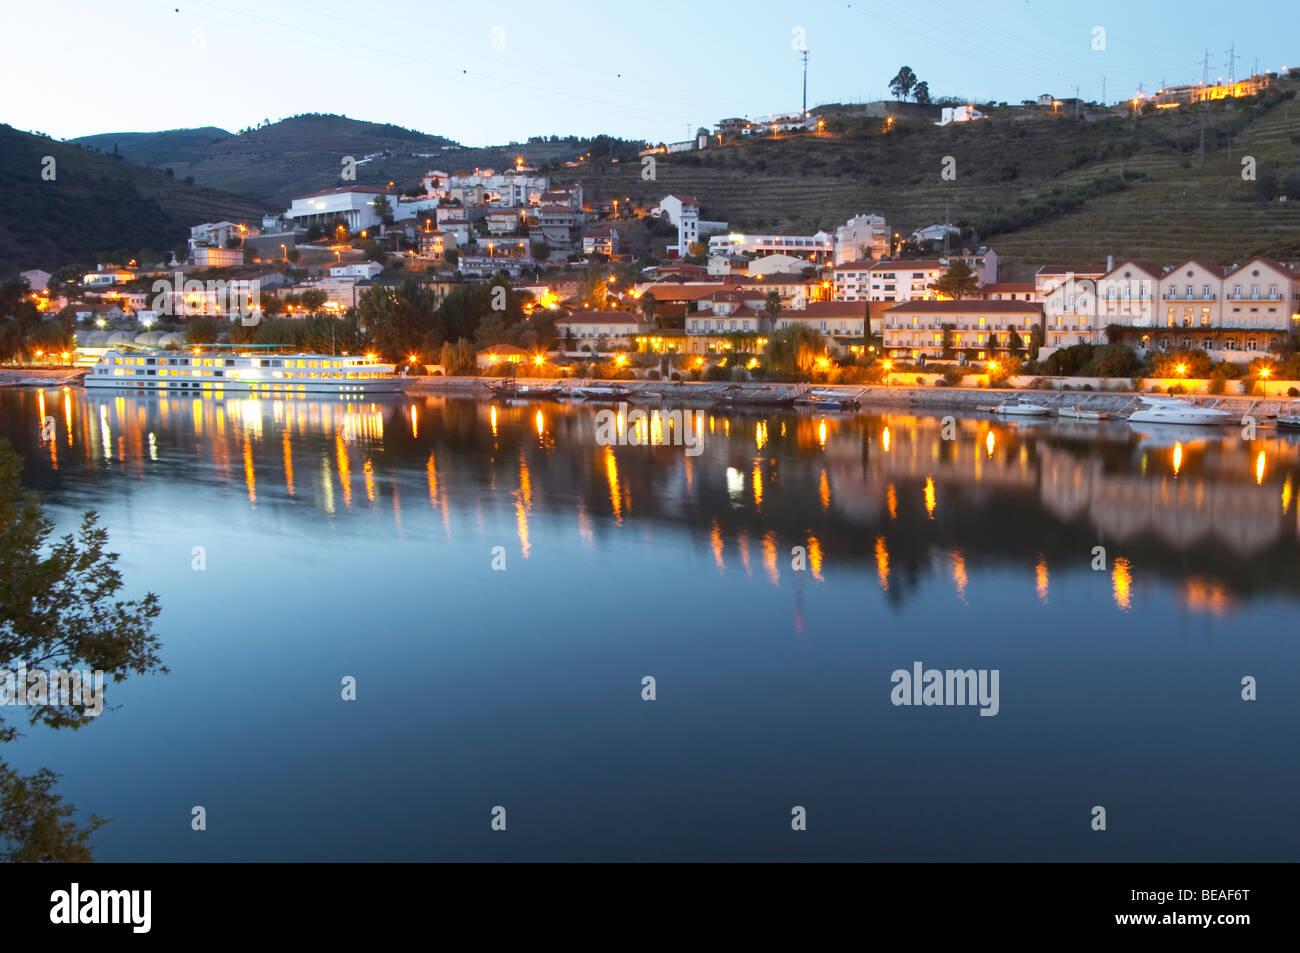 Pinhao town and douro river pinhao douro portugal - Stock Image